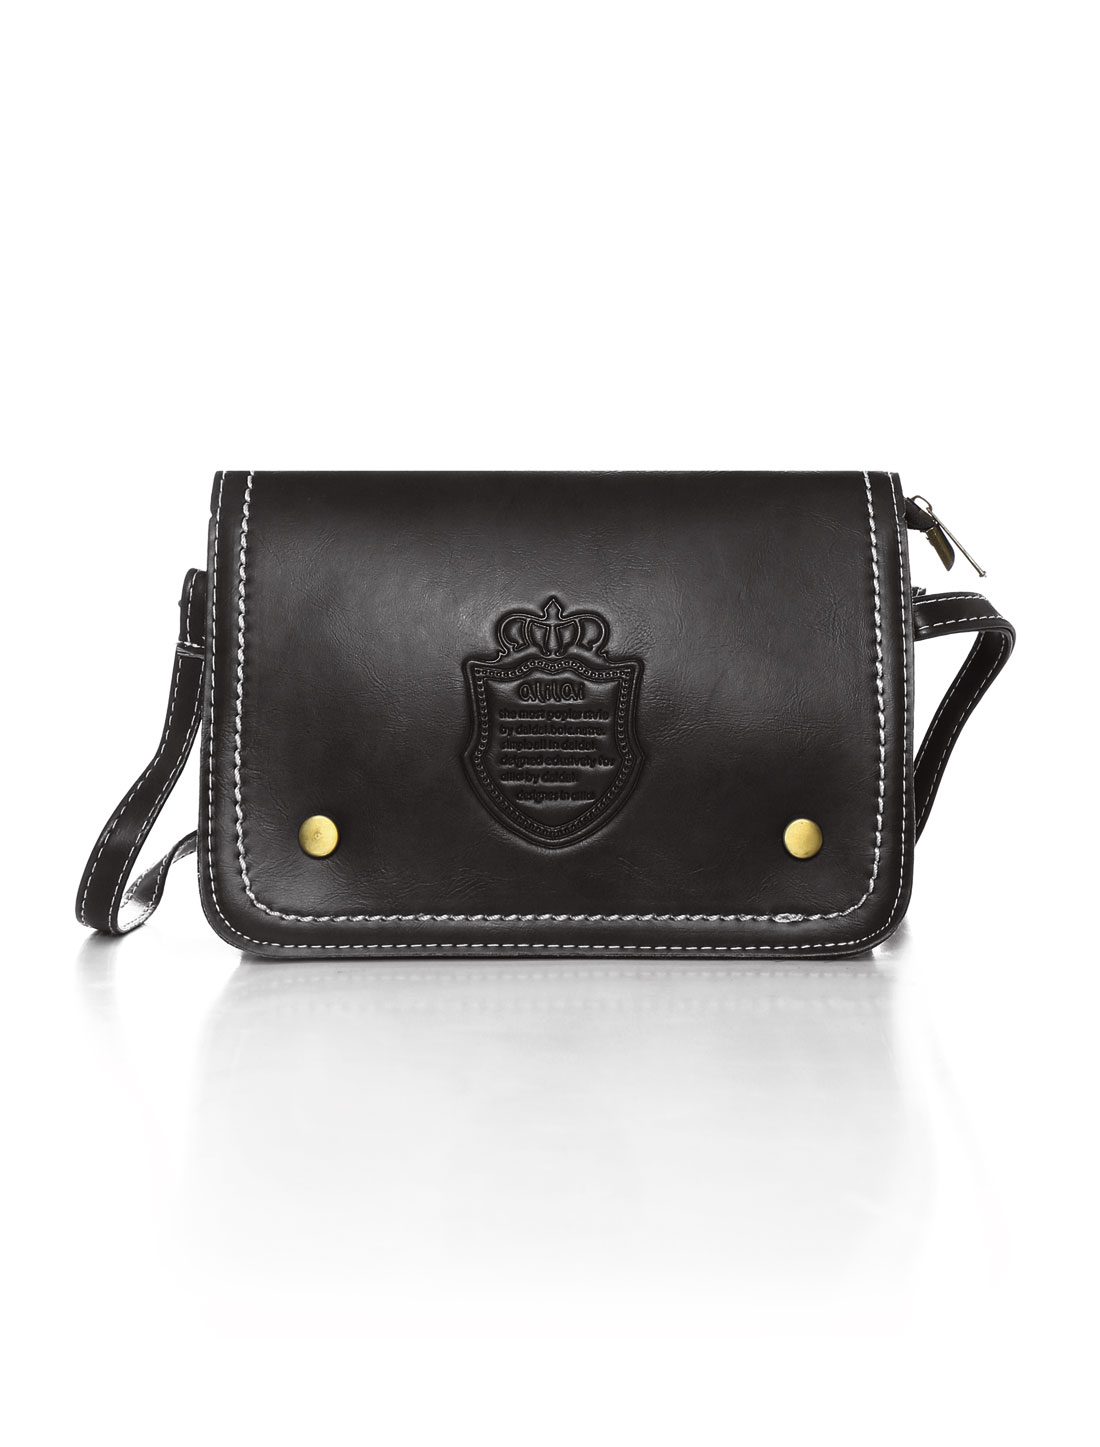 Women Letters Crown Embossed Magnetic Flap Closure Crossbody Bag Black